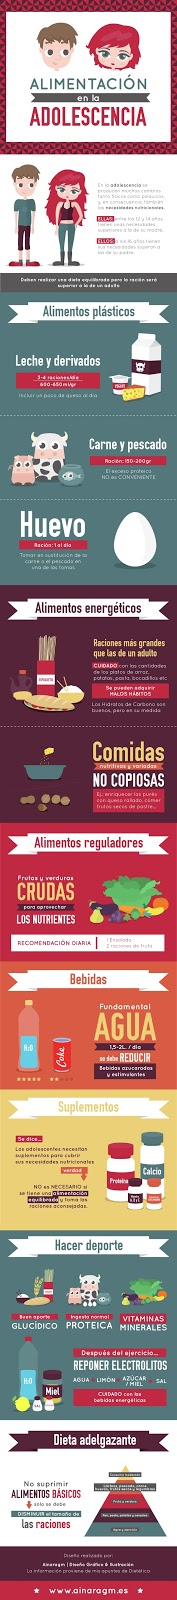 http://www.ainaragm.es/alimentacion-adolescencia/